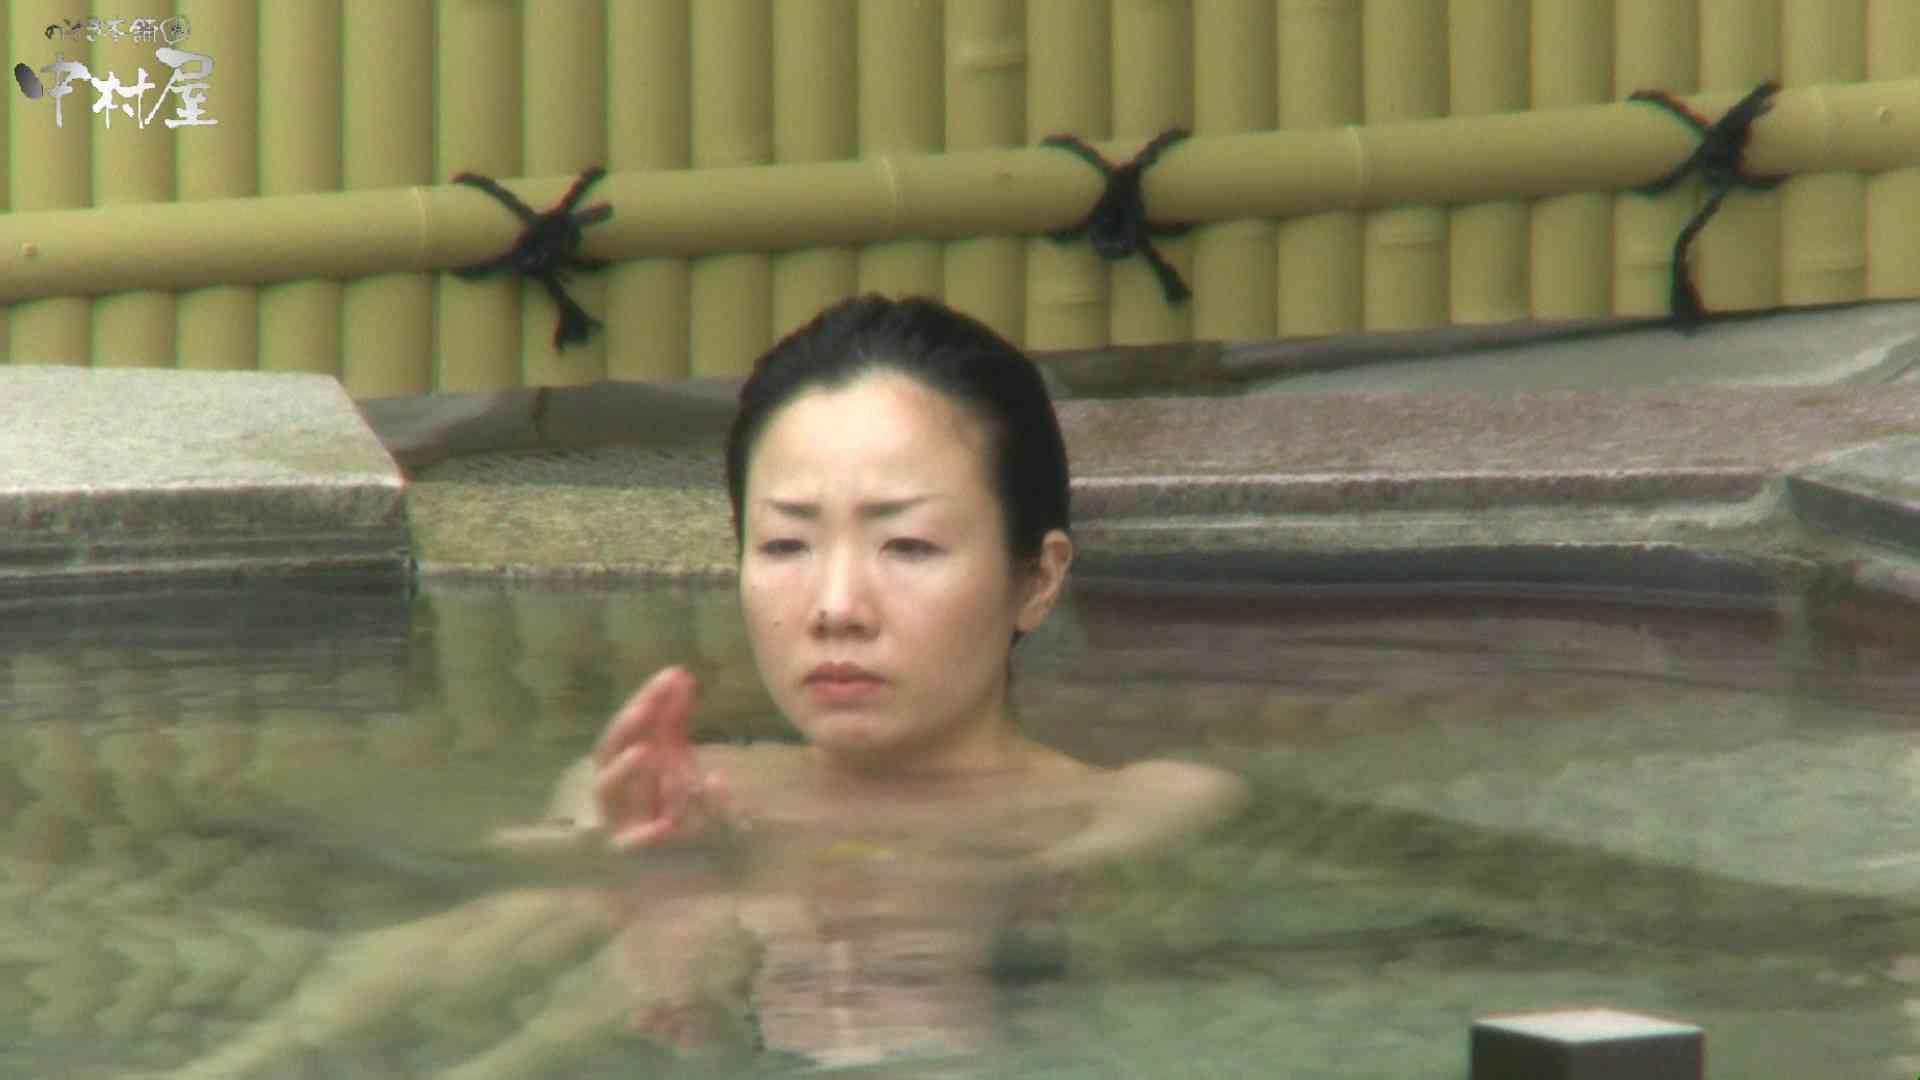 Aquaな露天風呂Vol.950 盗撮師作品 おまんこ動画流出 75pic 29